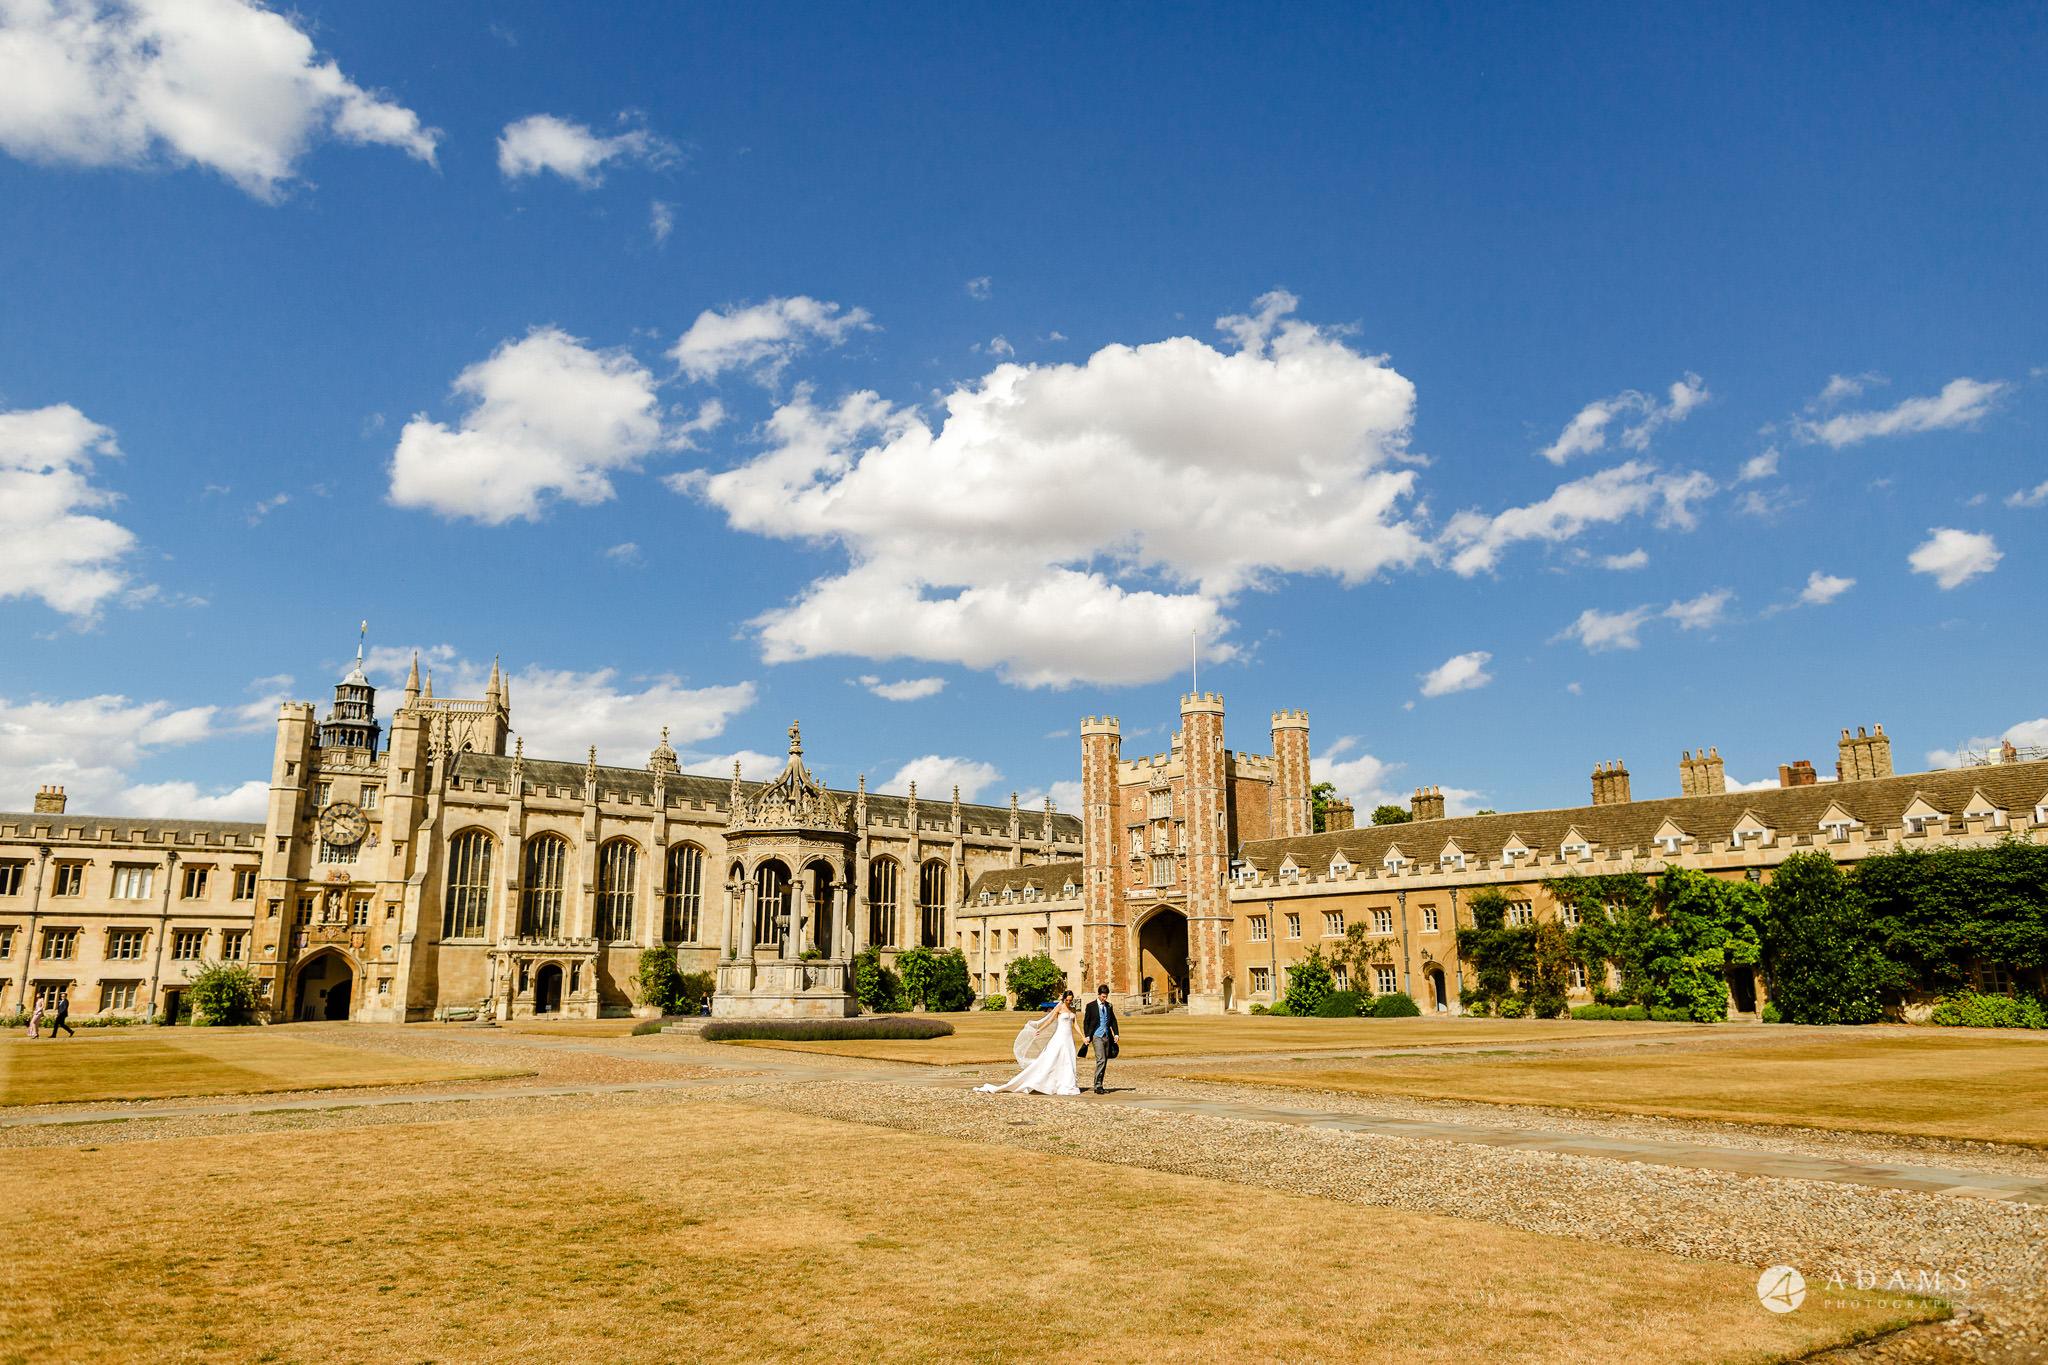 Trinity College Cambridge wedding bride and groom walk in the university courtyard